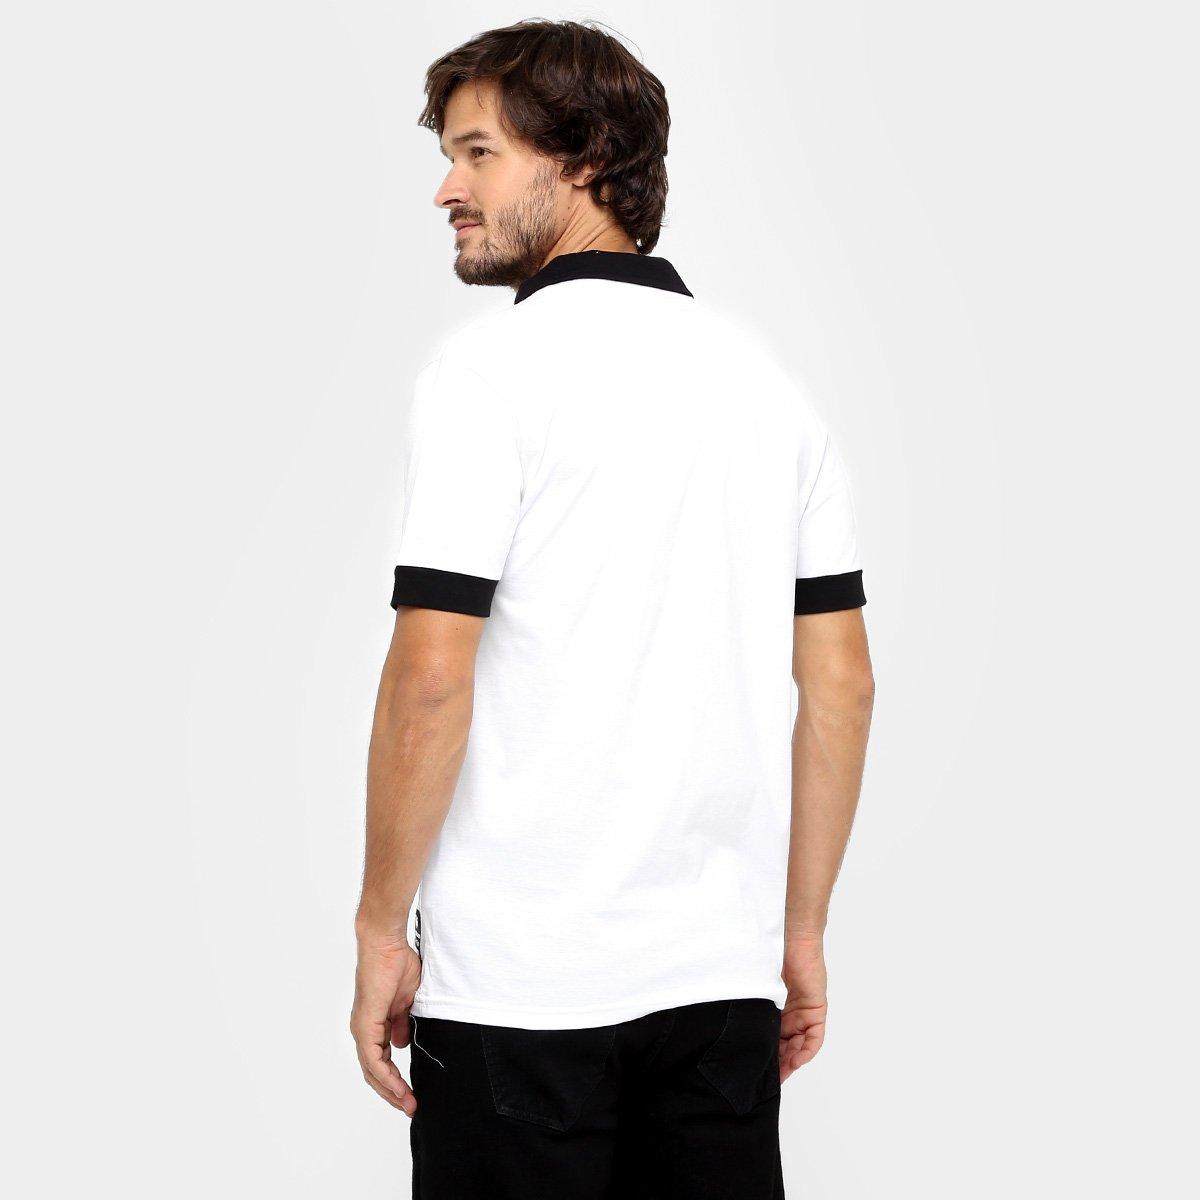 Camisa Polo Corinthian-Casuals Retrô Masculina - Tam: P - 1